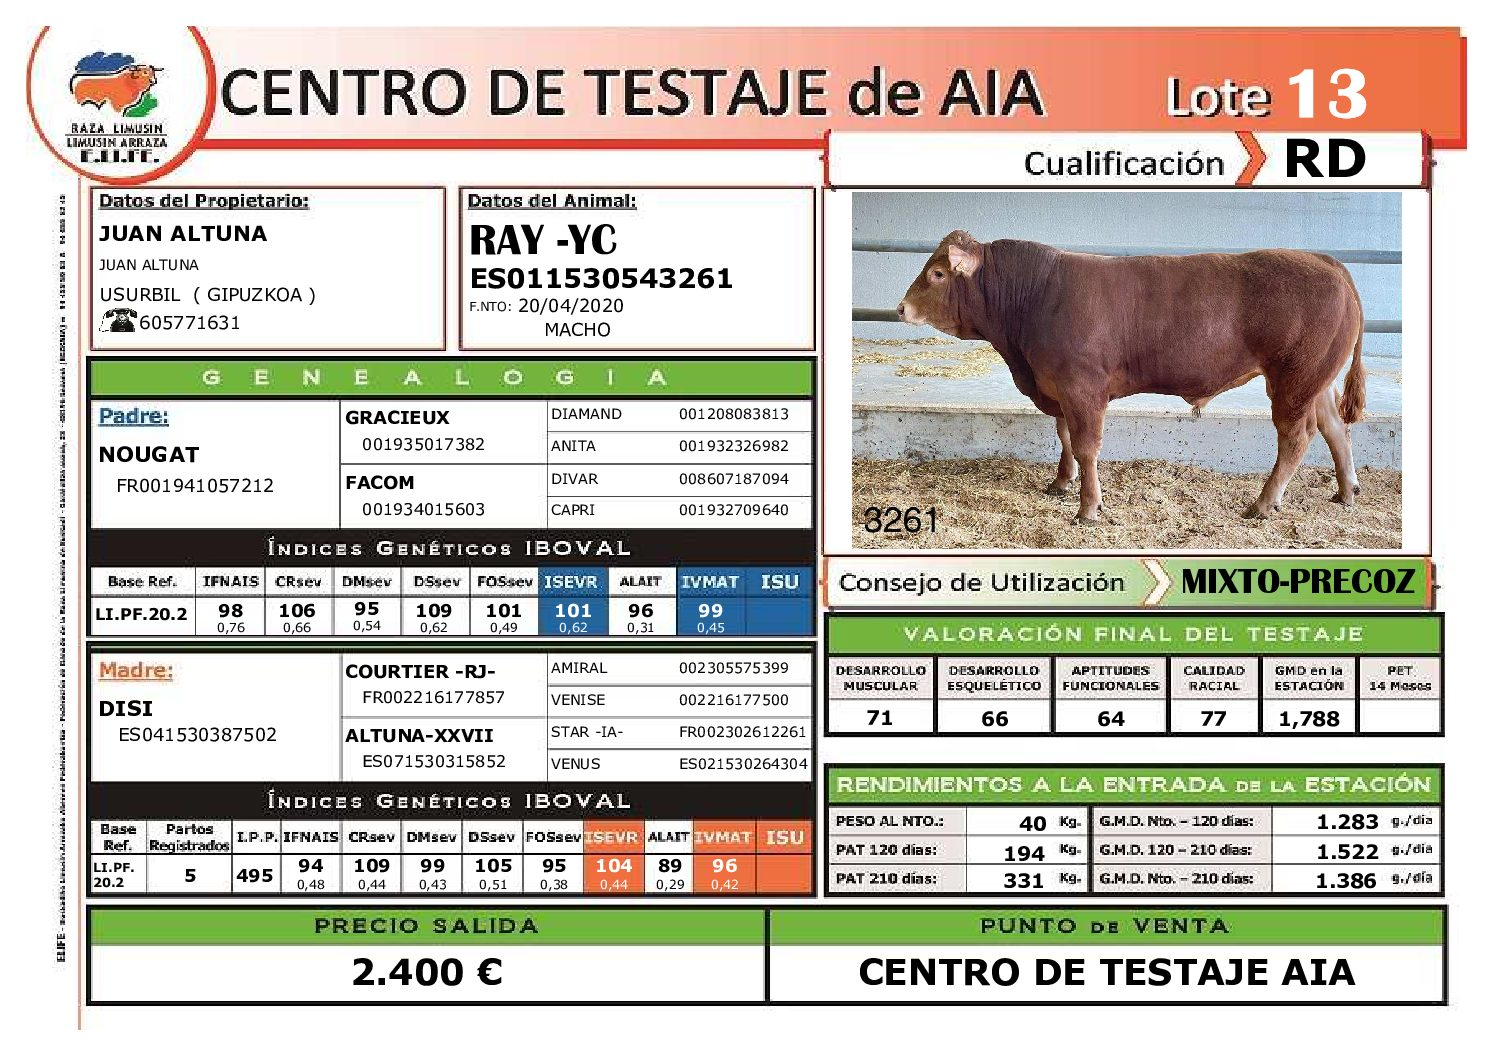 RAY-YC (Limusin Aptitud Cárnica). Criador: Juan Altuna